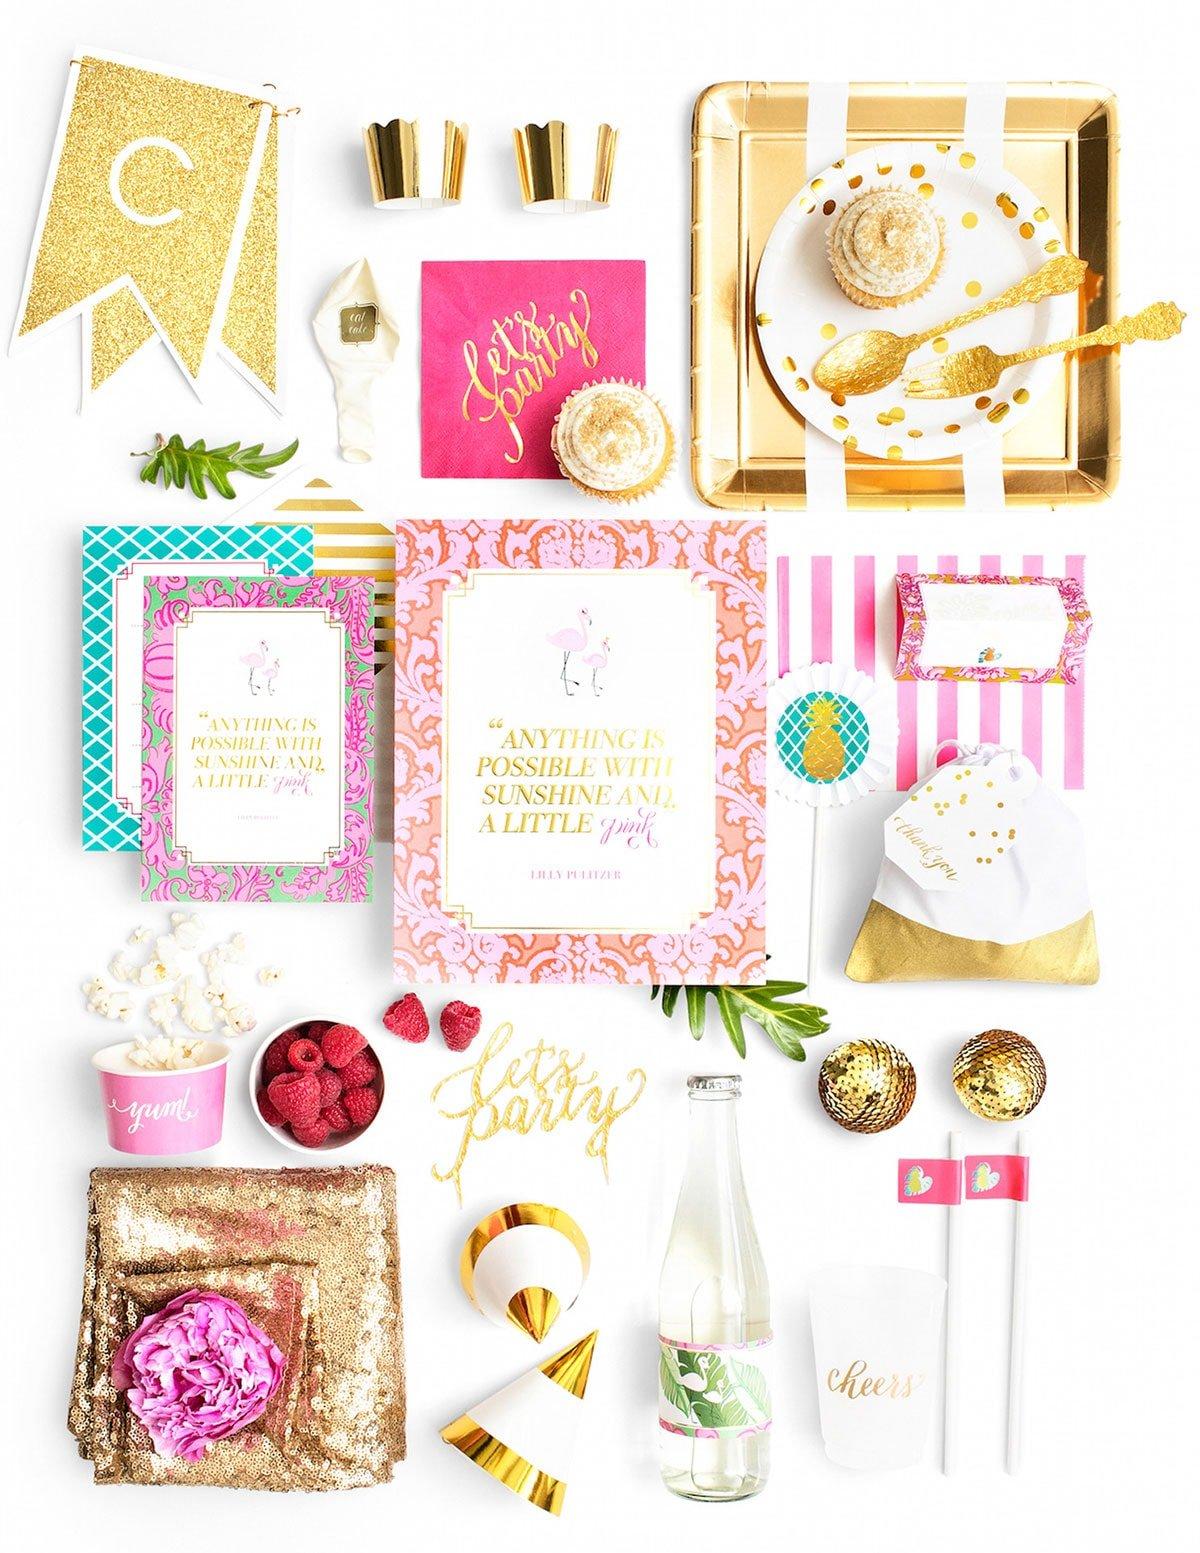 Flamingos & Sunshine Party in a Box! SO CUTE!